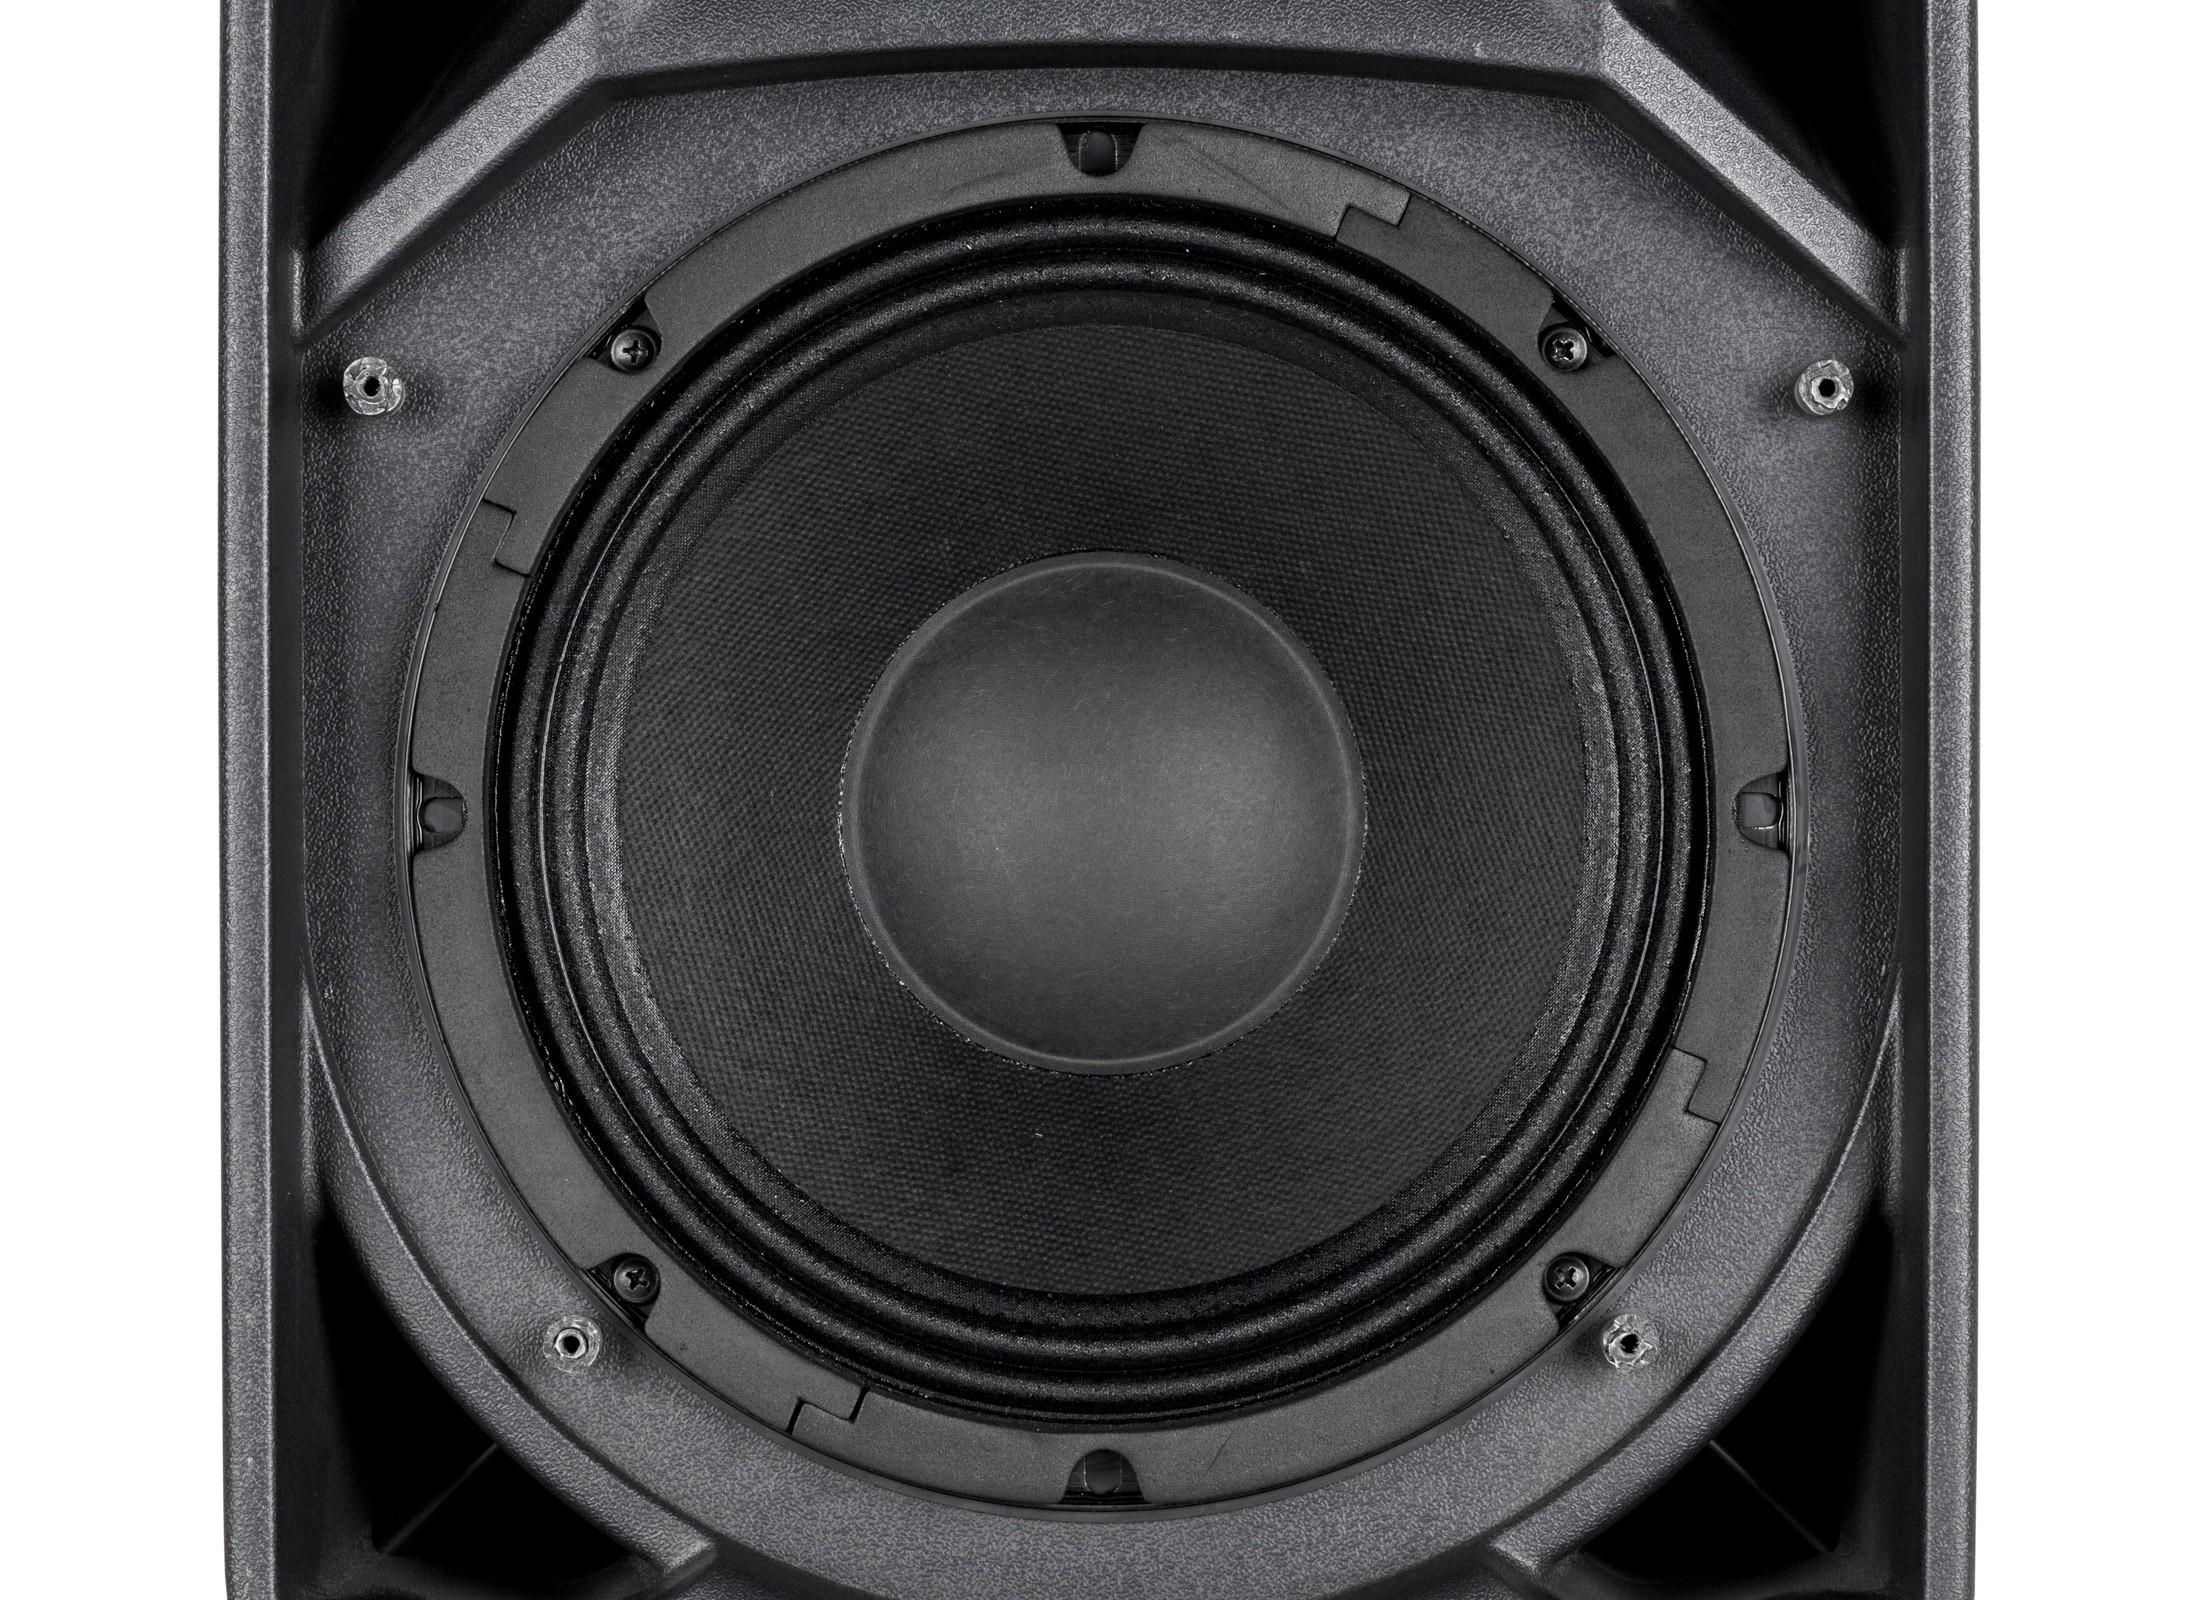 RCF ART 710-A MK4 Active Box digital, 10''/1'', 700W, 90°x70°, black,  Adaptor: 36mm / 2x M10